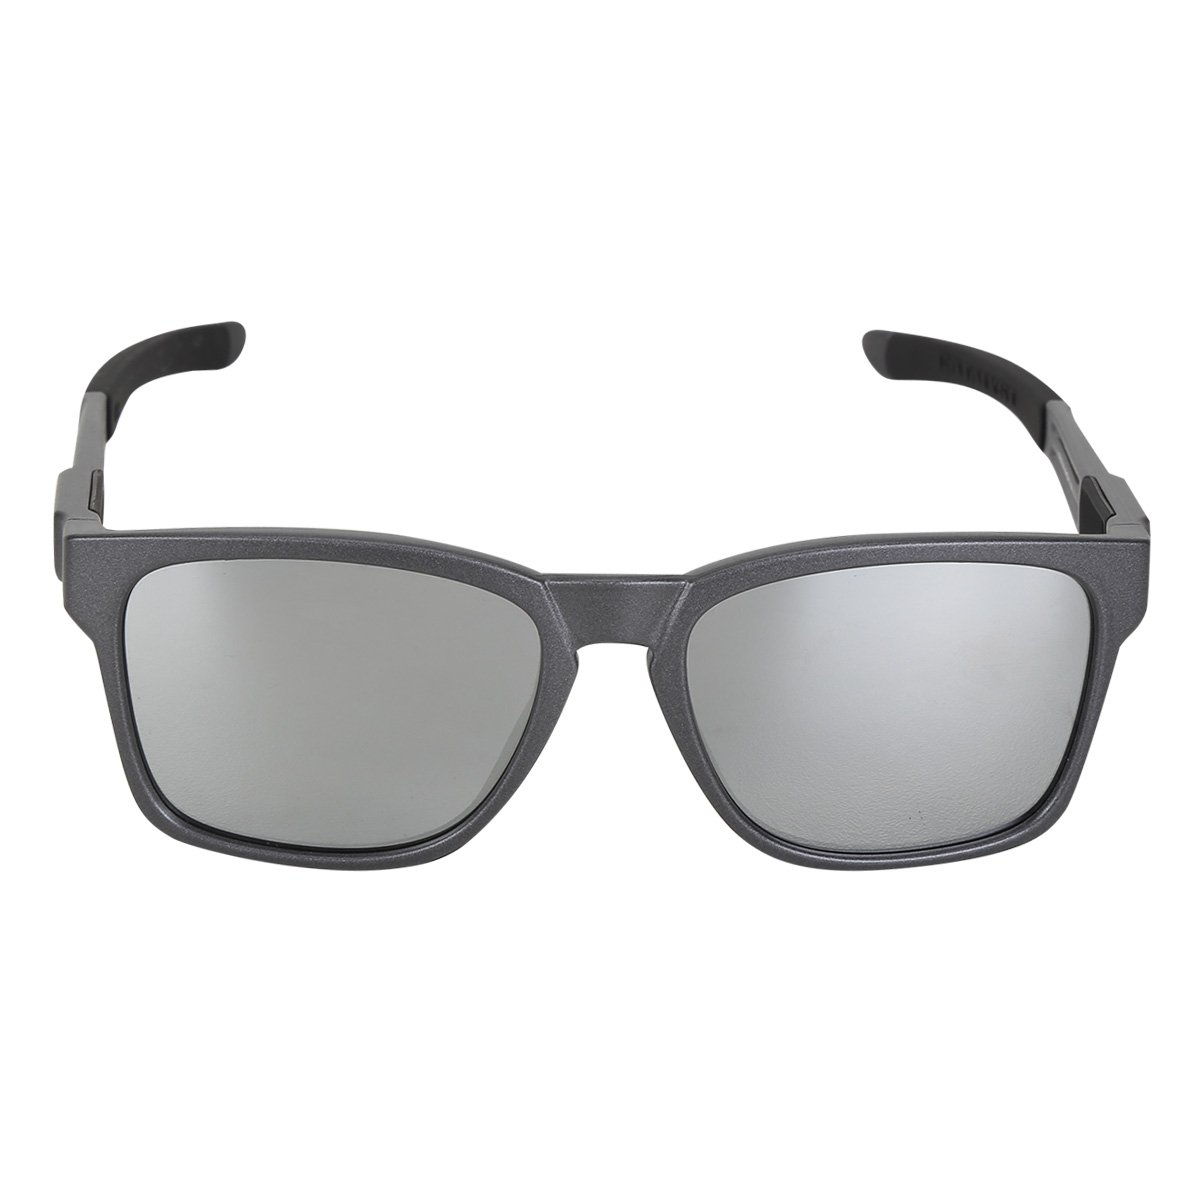 Óculos de Sol Oakley Catalyst Iridium Masculino - Compre Agora ... 635973aa41